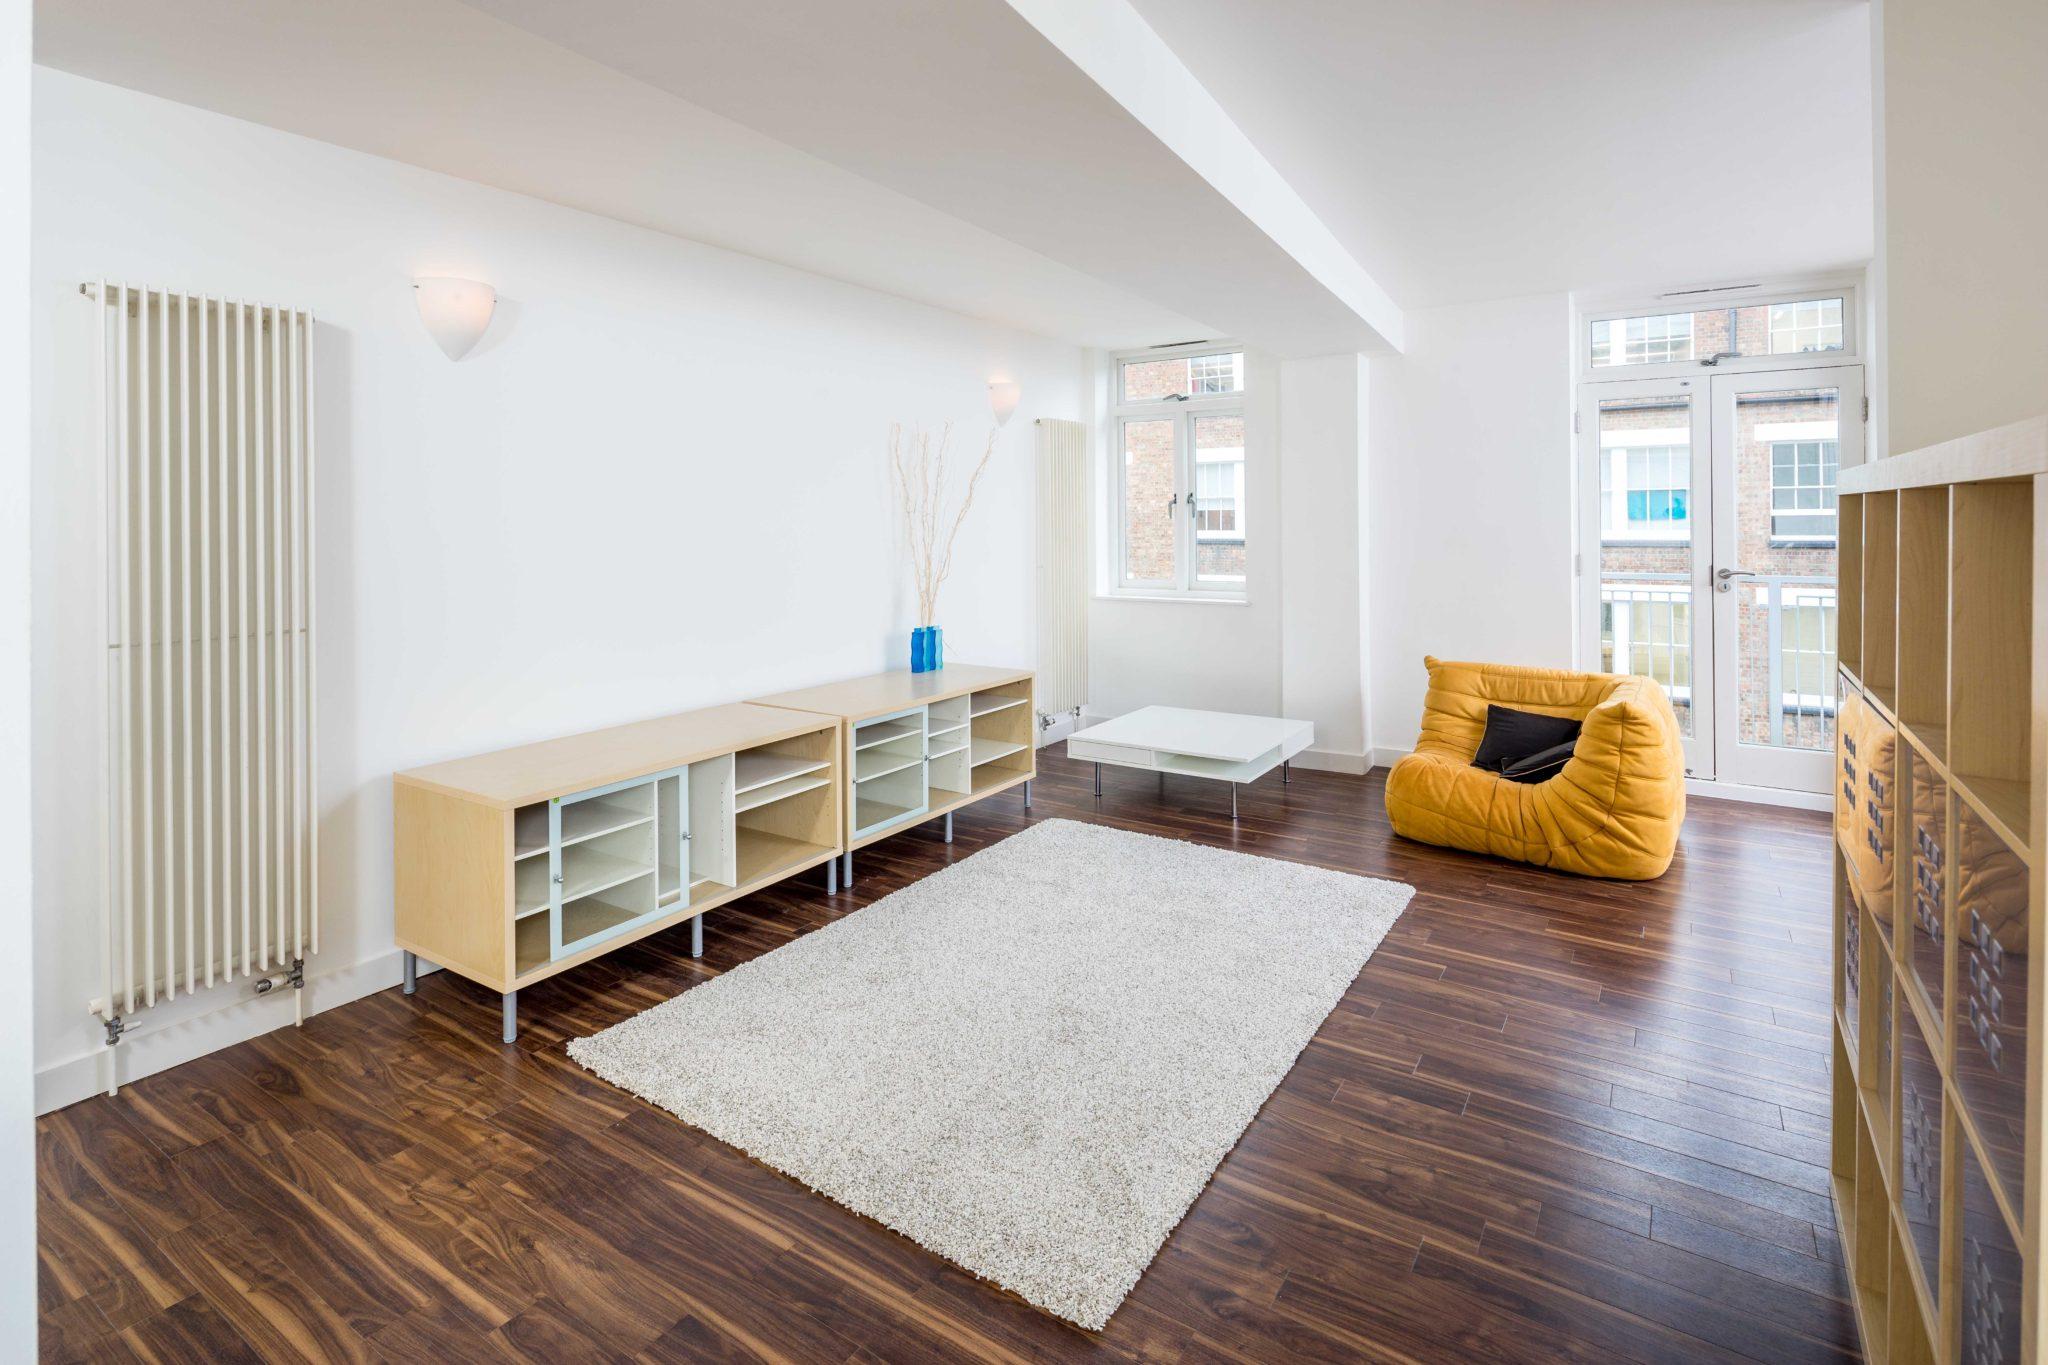 London-Corporate-Accommodation-Clerkenwell---Book-Cheap-London-Serviced-Accommodation-Now!-Corporate-Serviced-Apartments-London---Free-Wifi-|-Urban-Stay